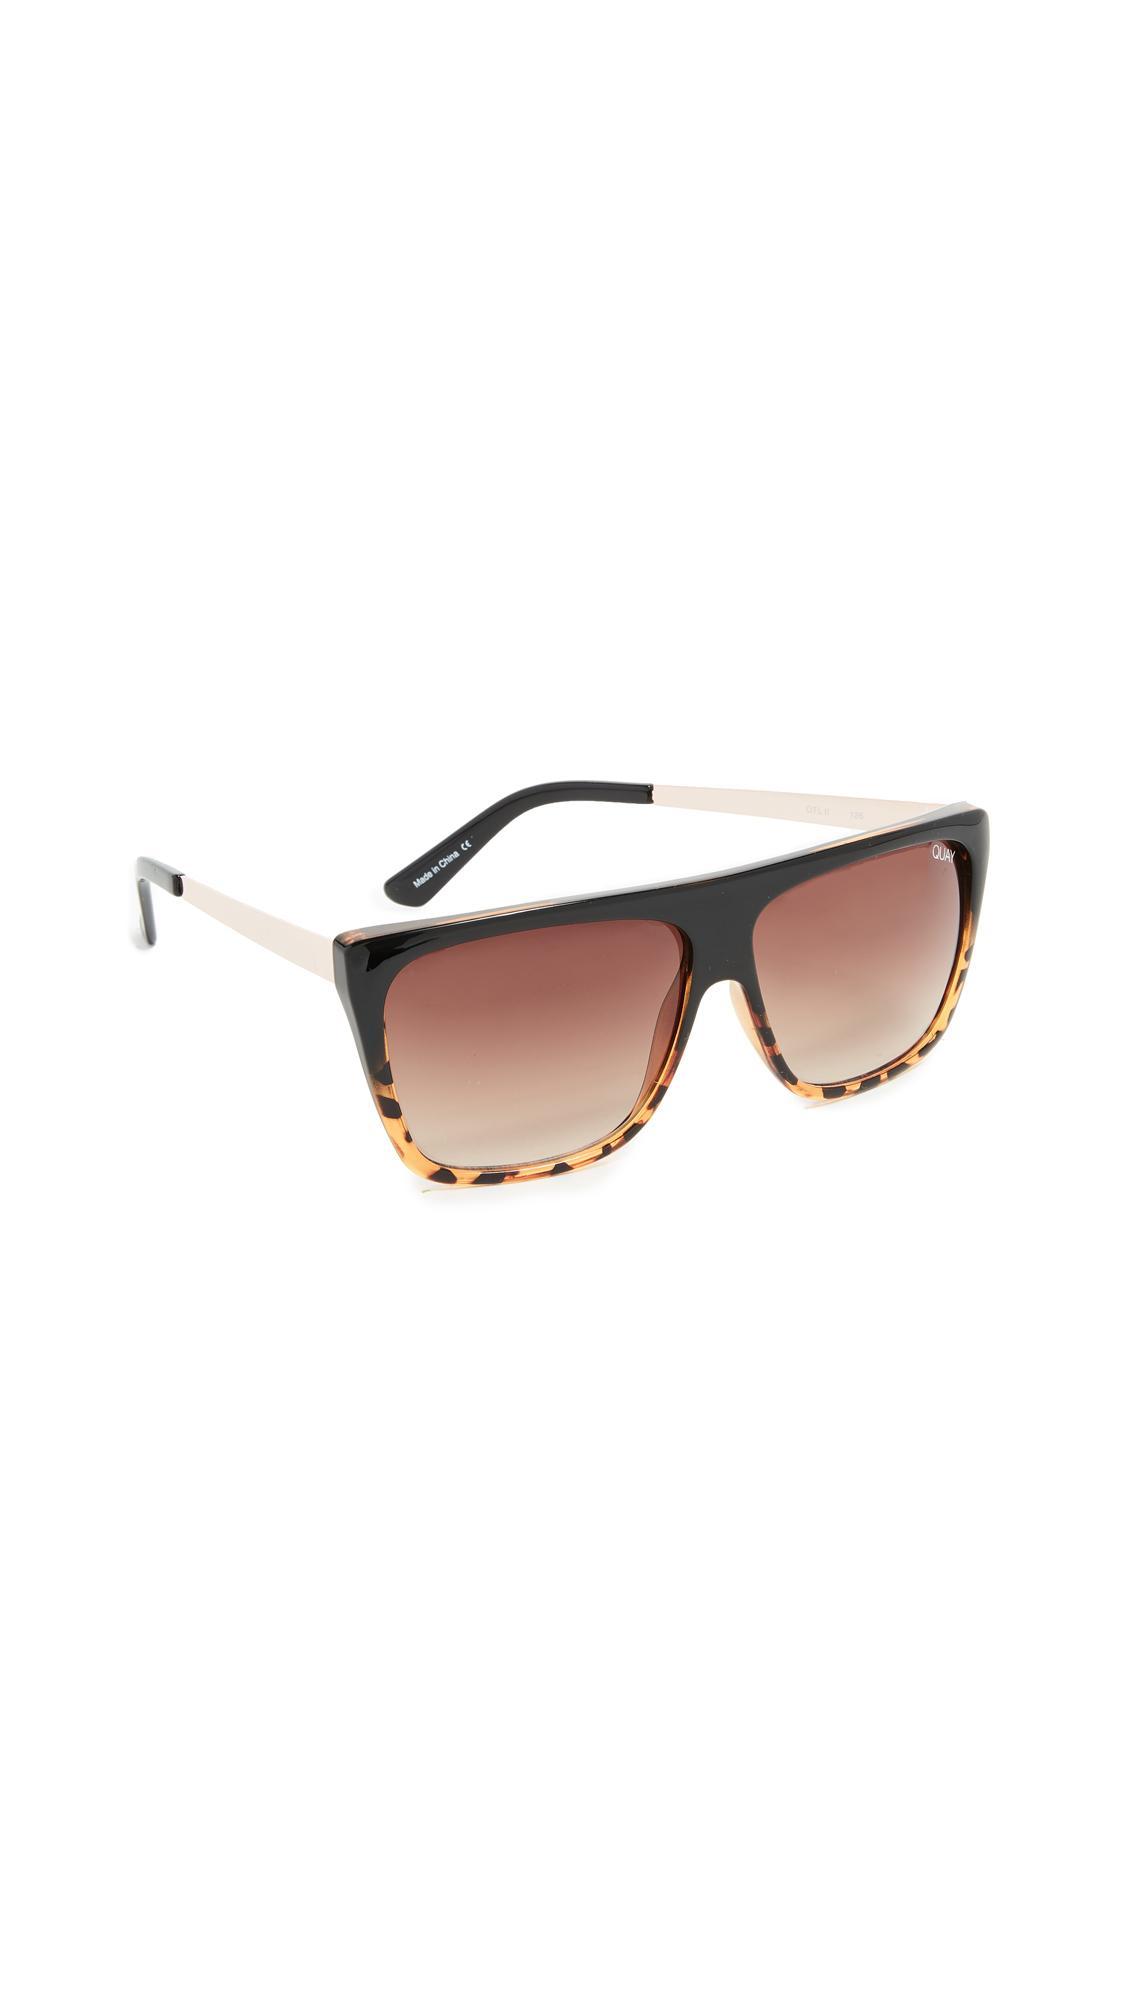 93d2122b2ba Quay X Desi Perkins Otl Ii Sunglasses In Black Fade Brown